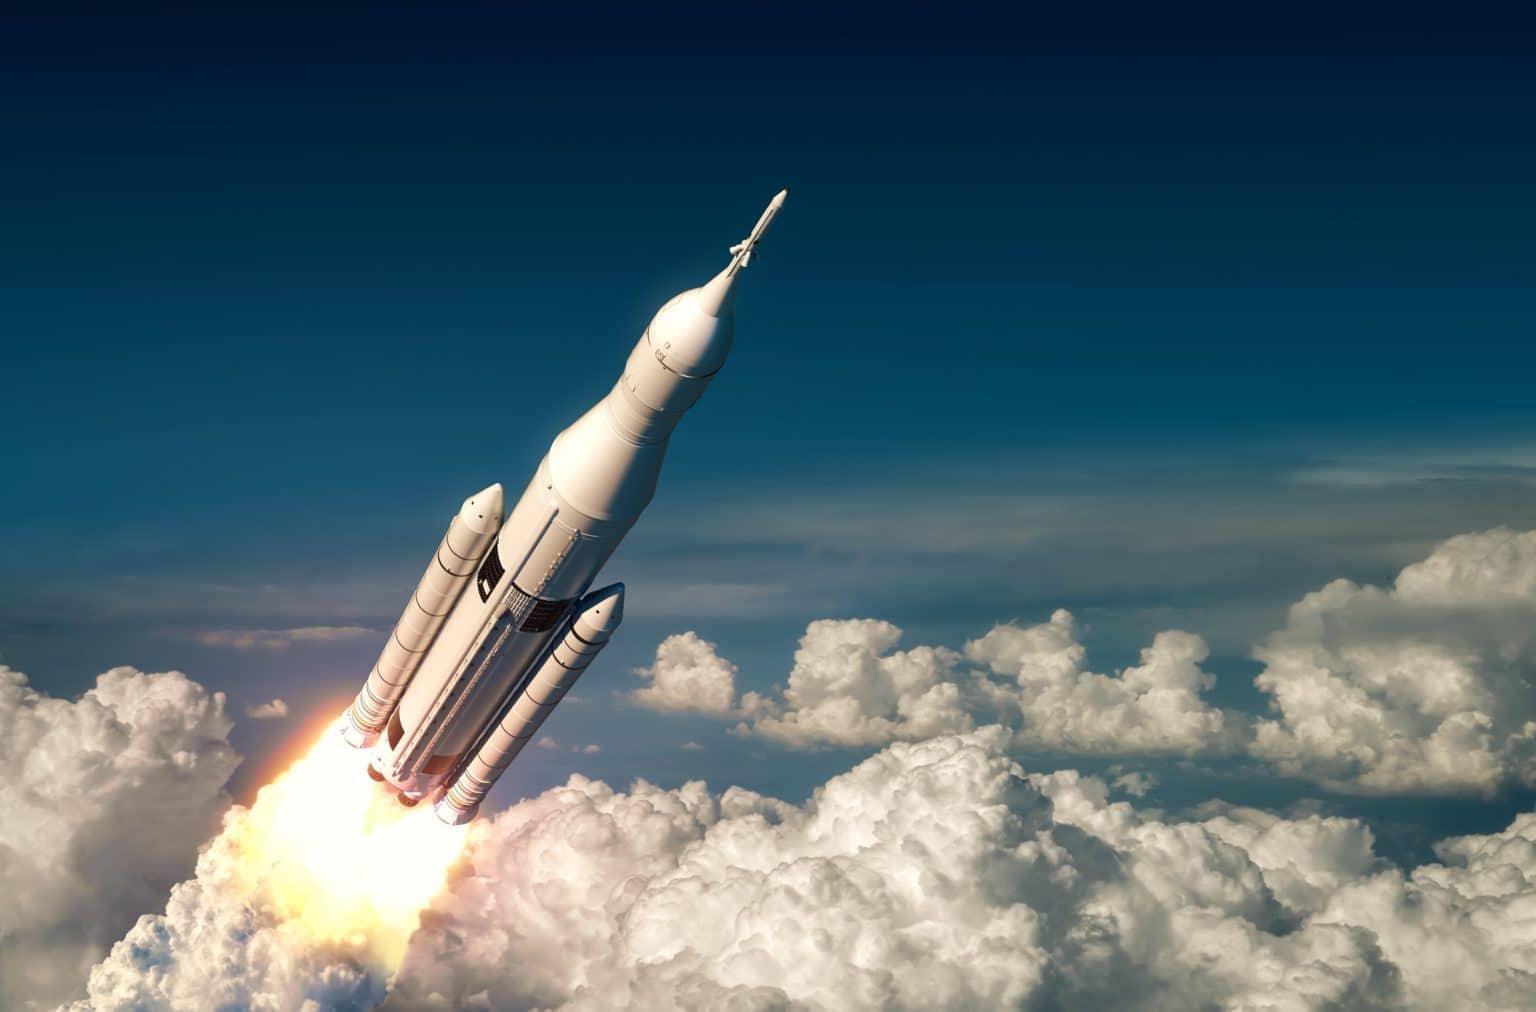 Heavy_rocket_10.0-launches_298895725-2160-1536x1012.jpg